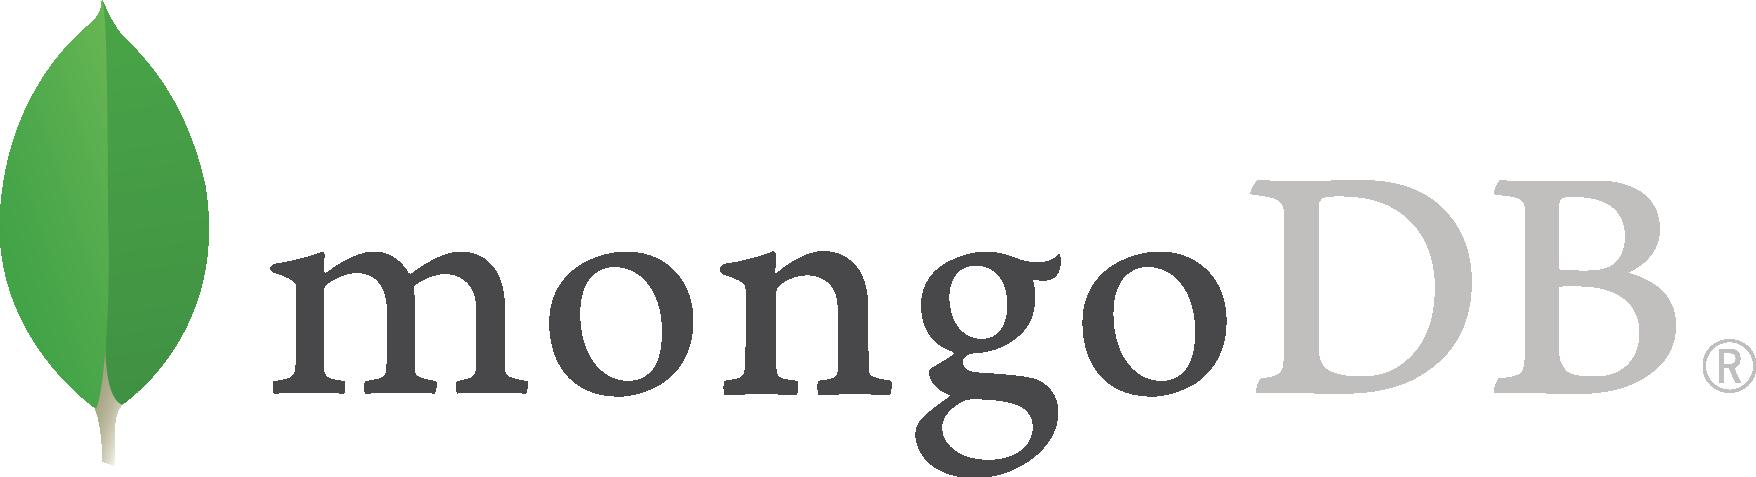 1101-sdt-mongo